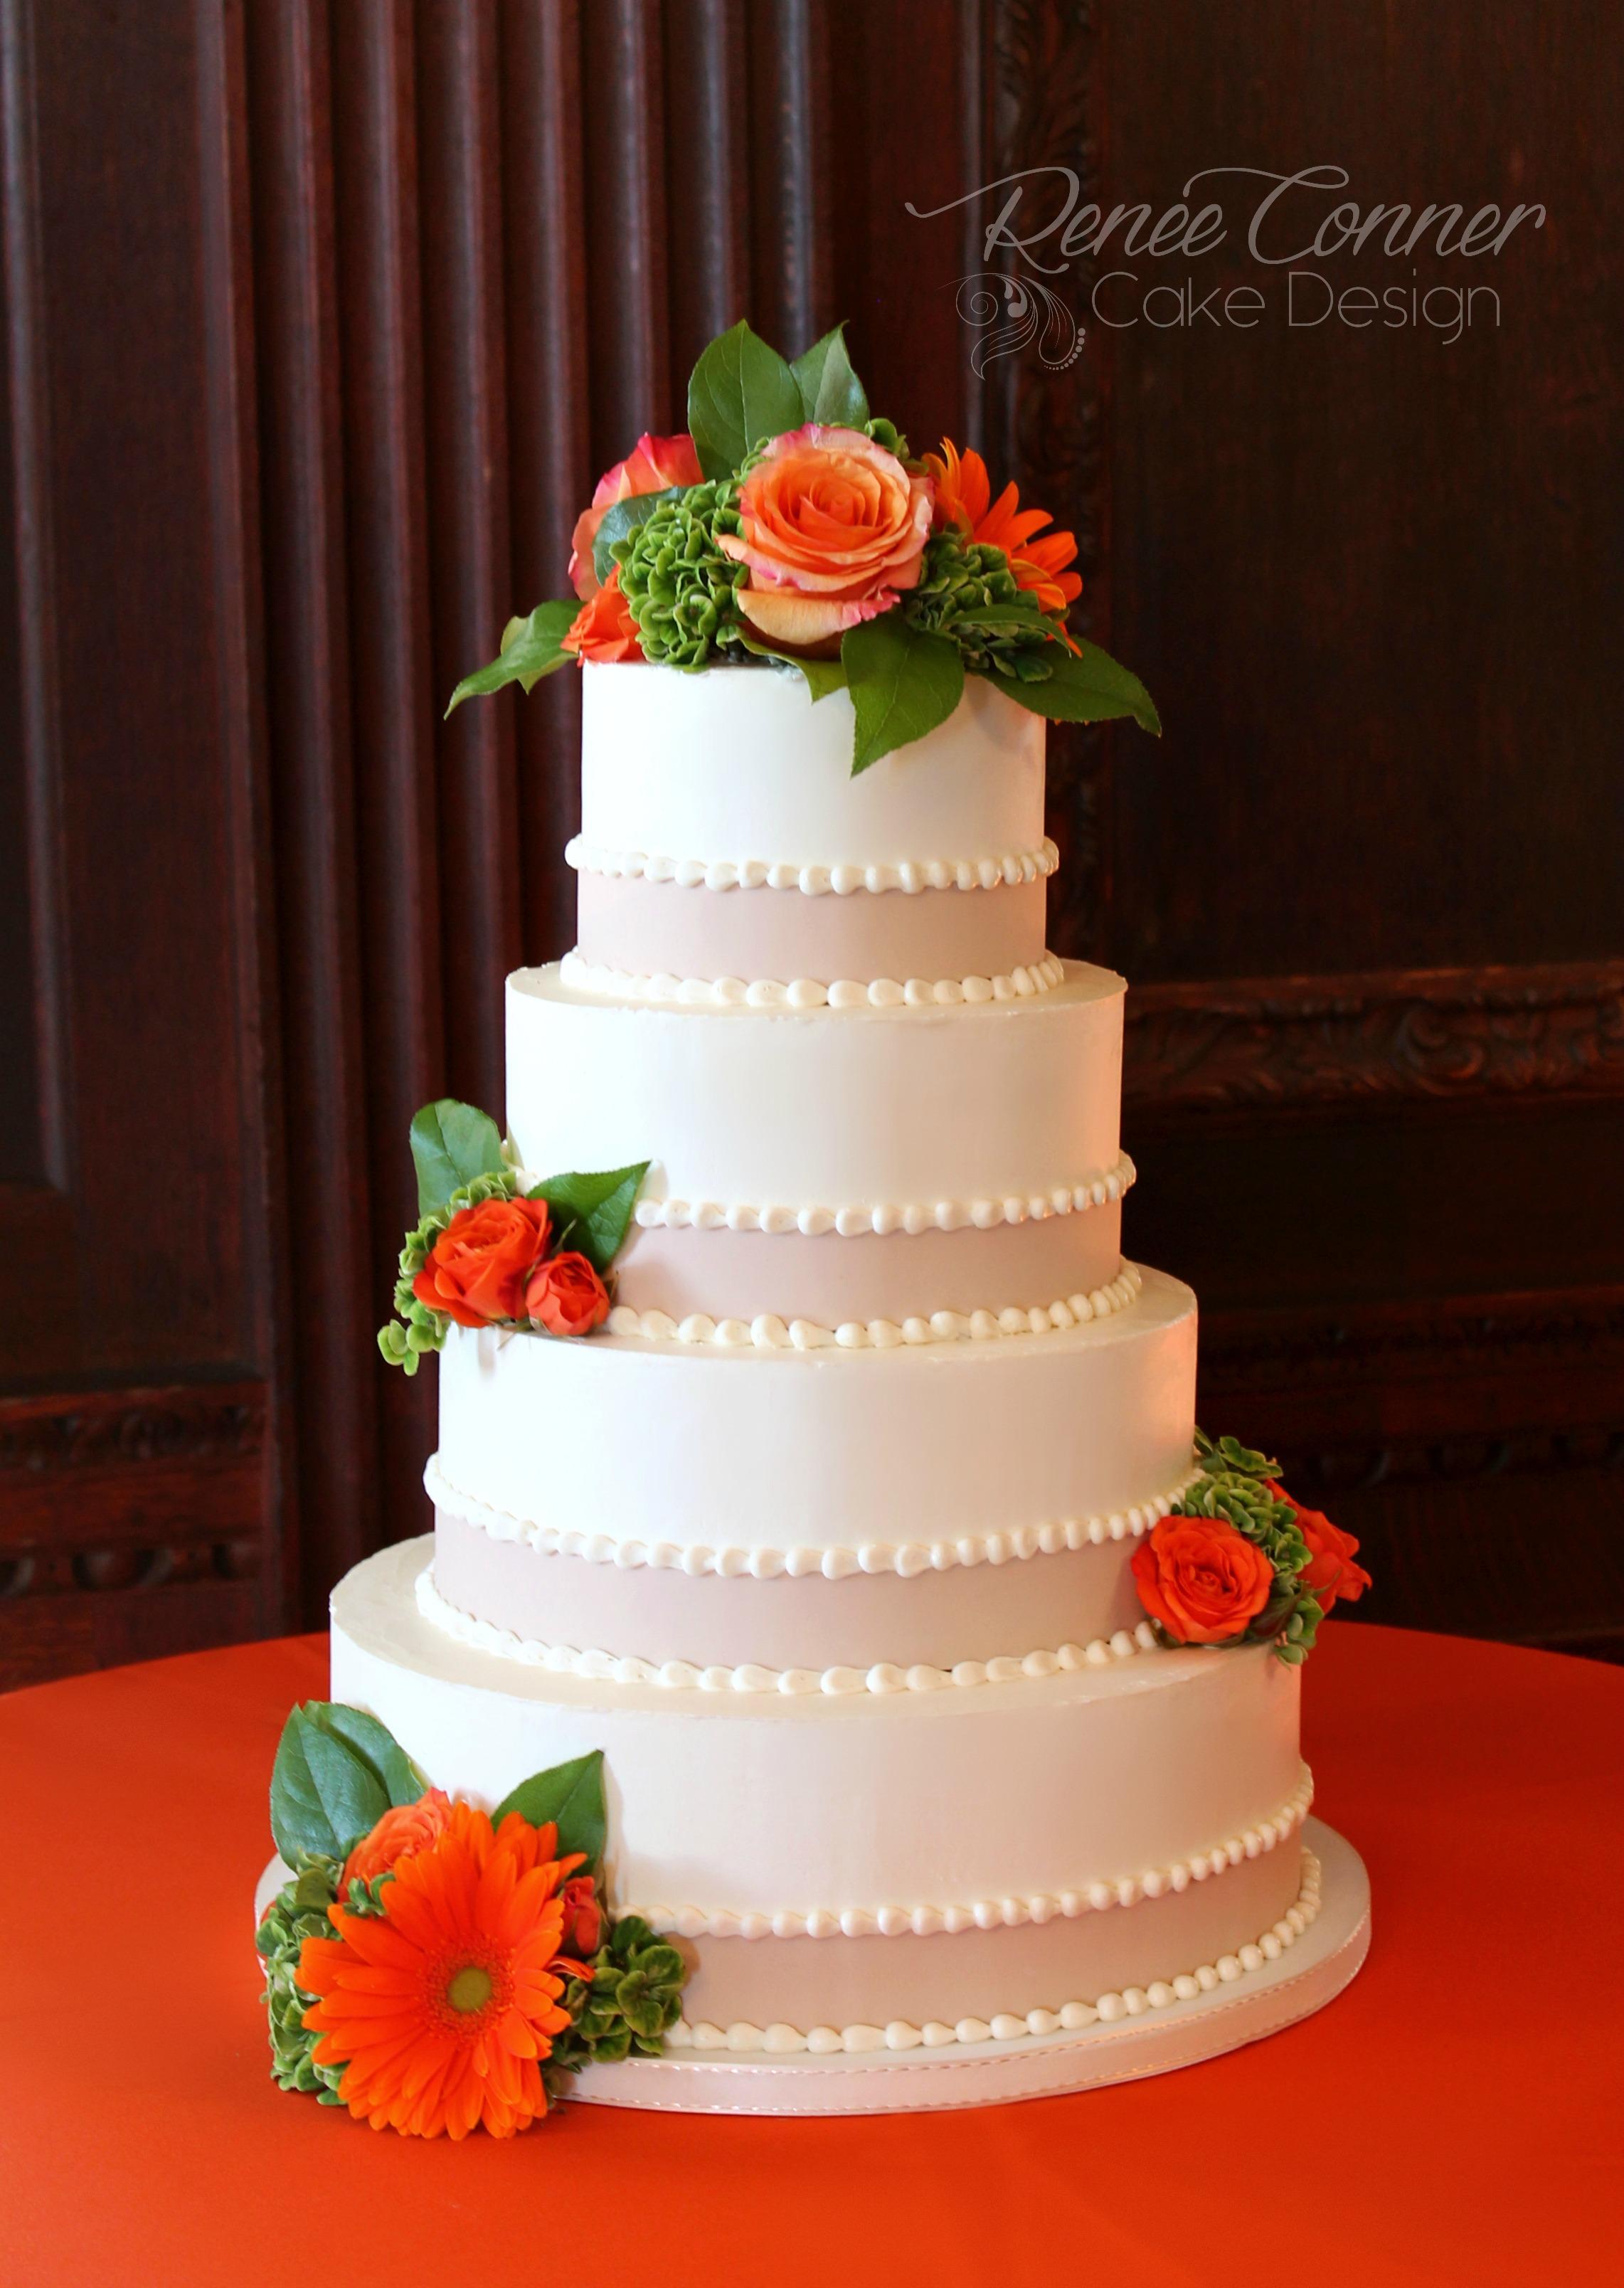 Gallery Renee Conner Cake Design